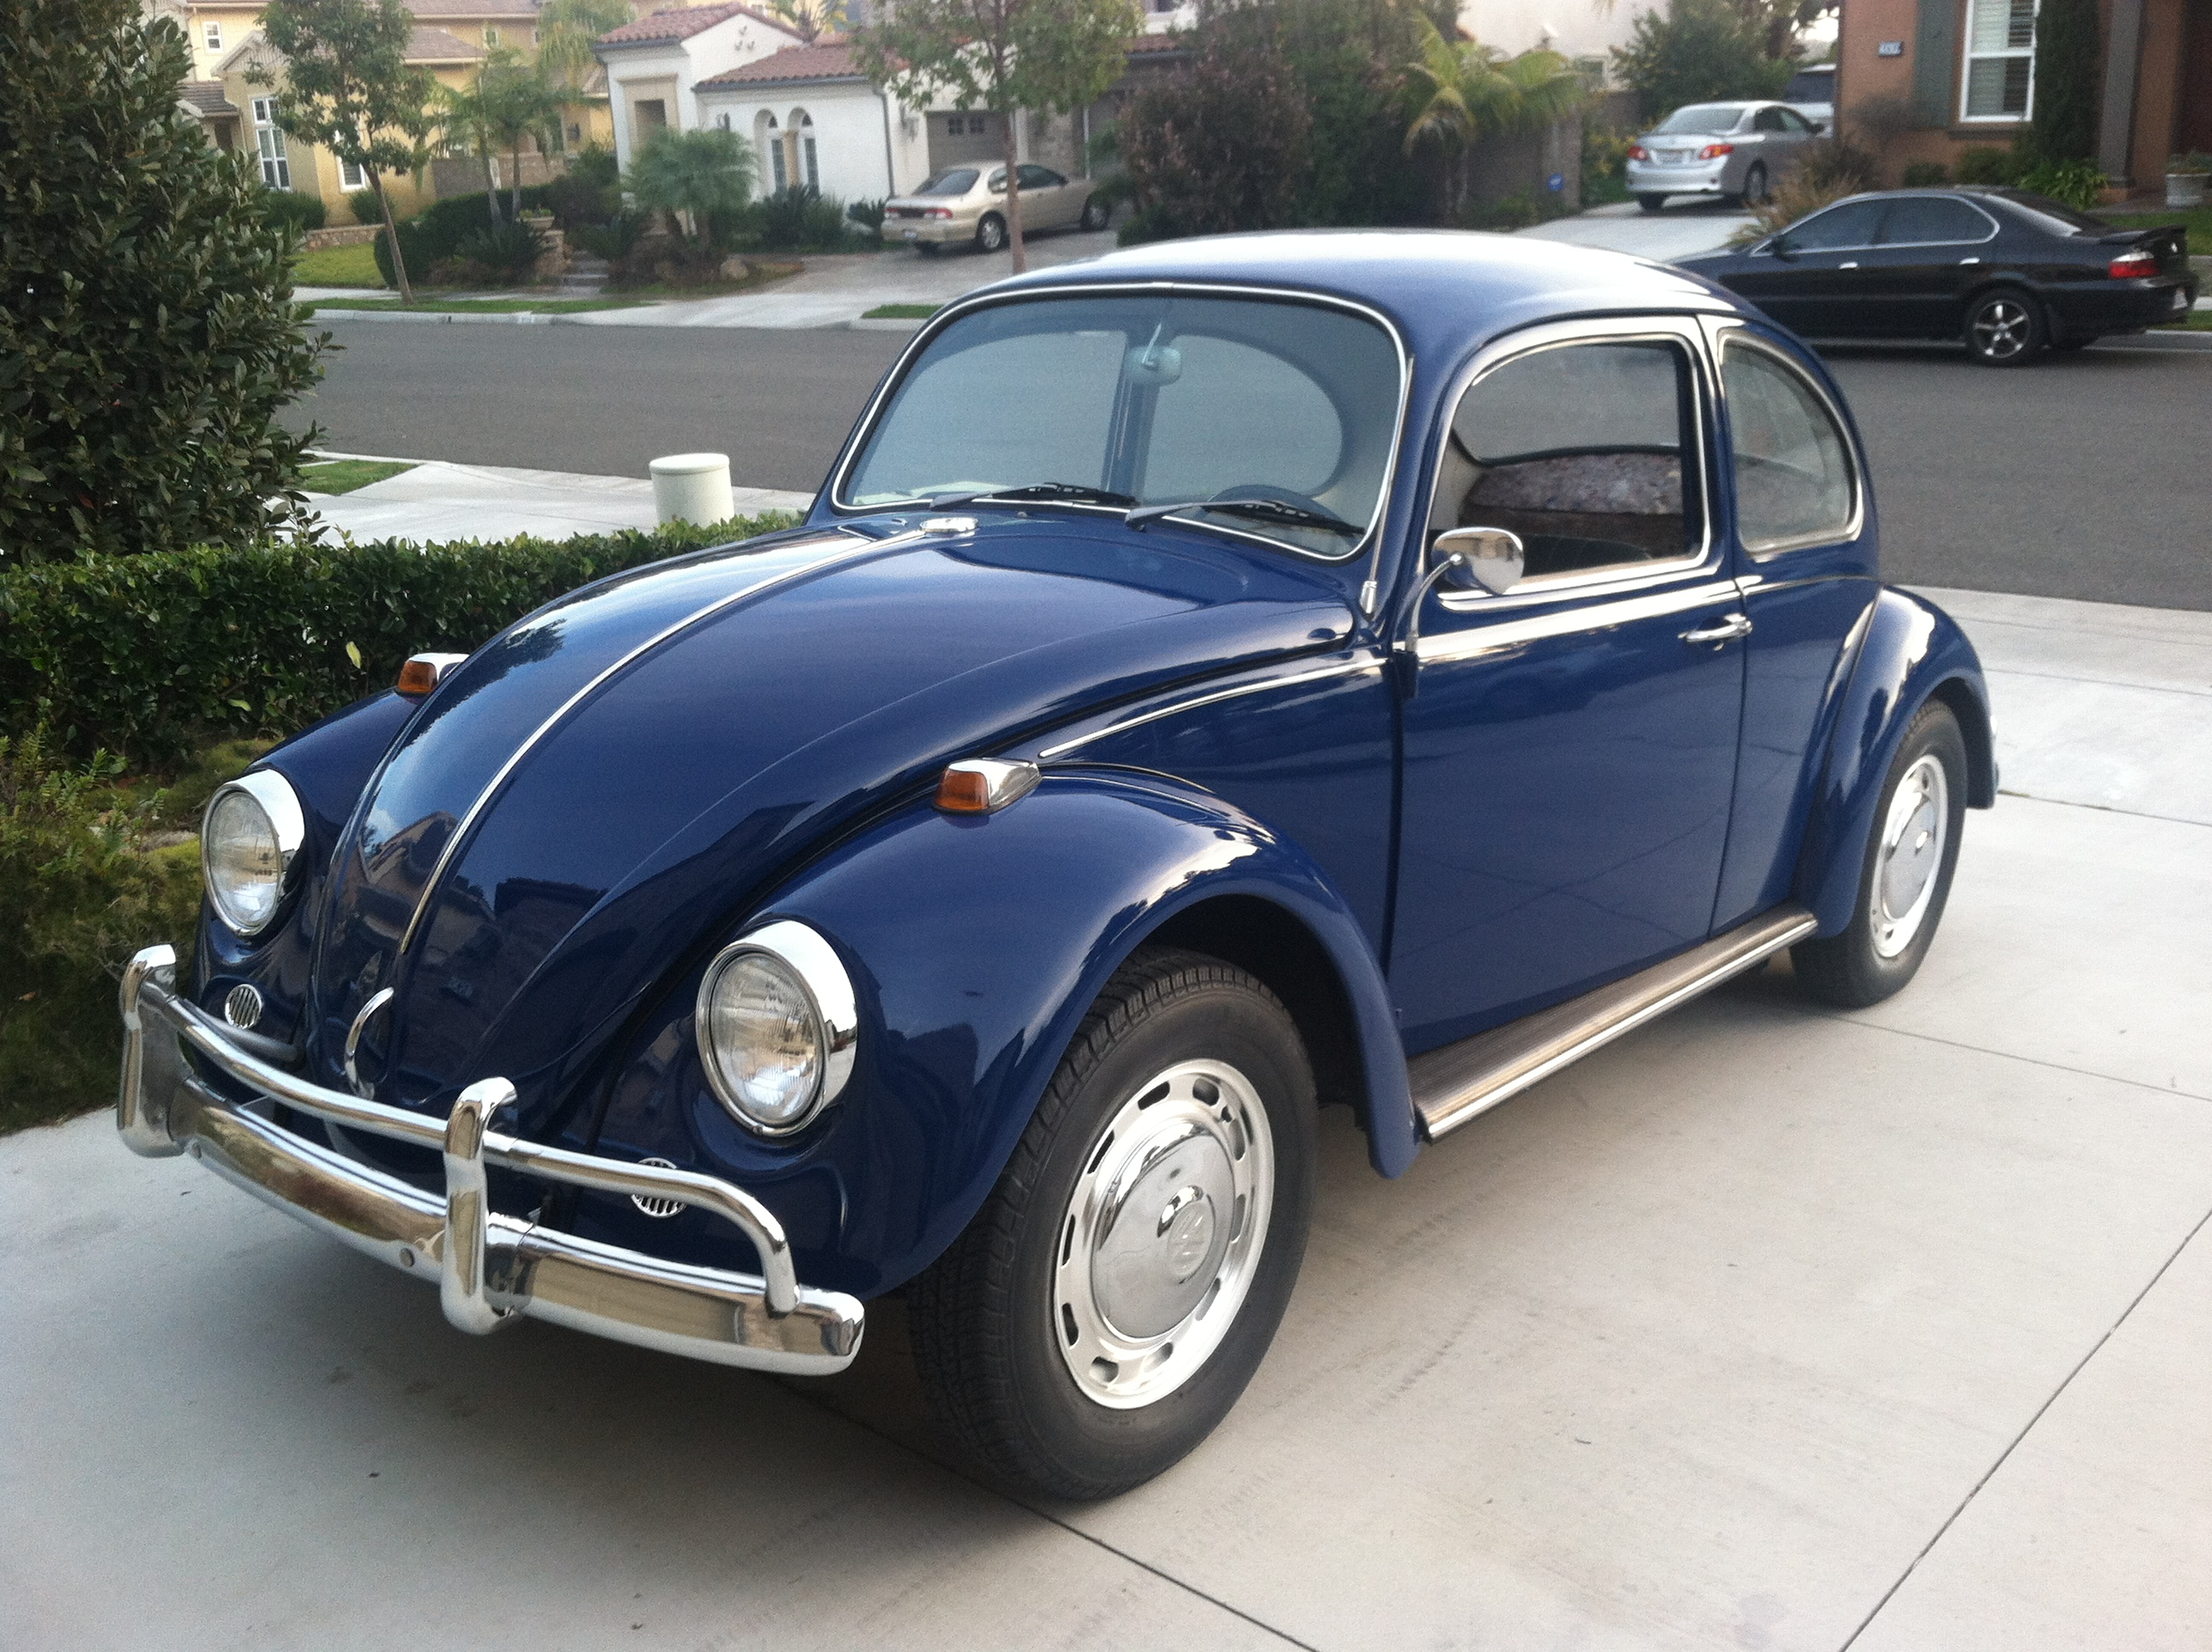 SOLD: L633 VW Blue '67 Beetle - 1967 VW Beetle